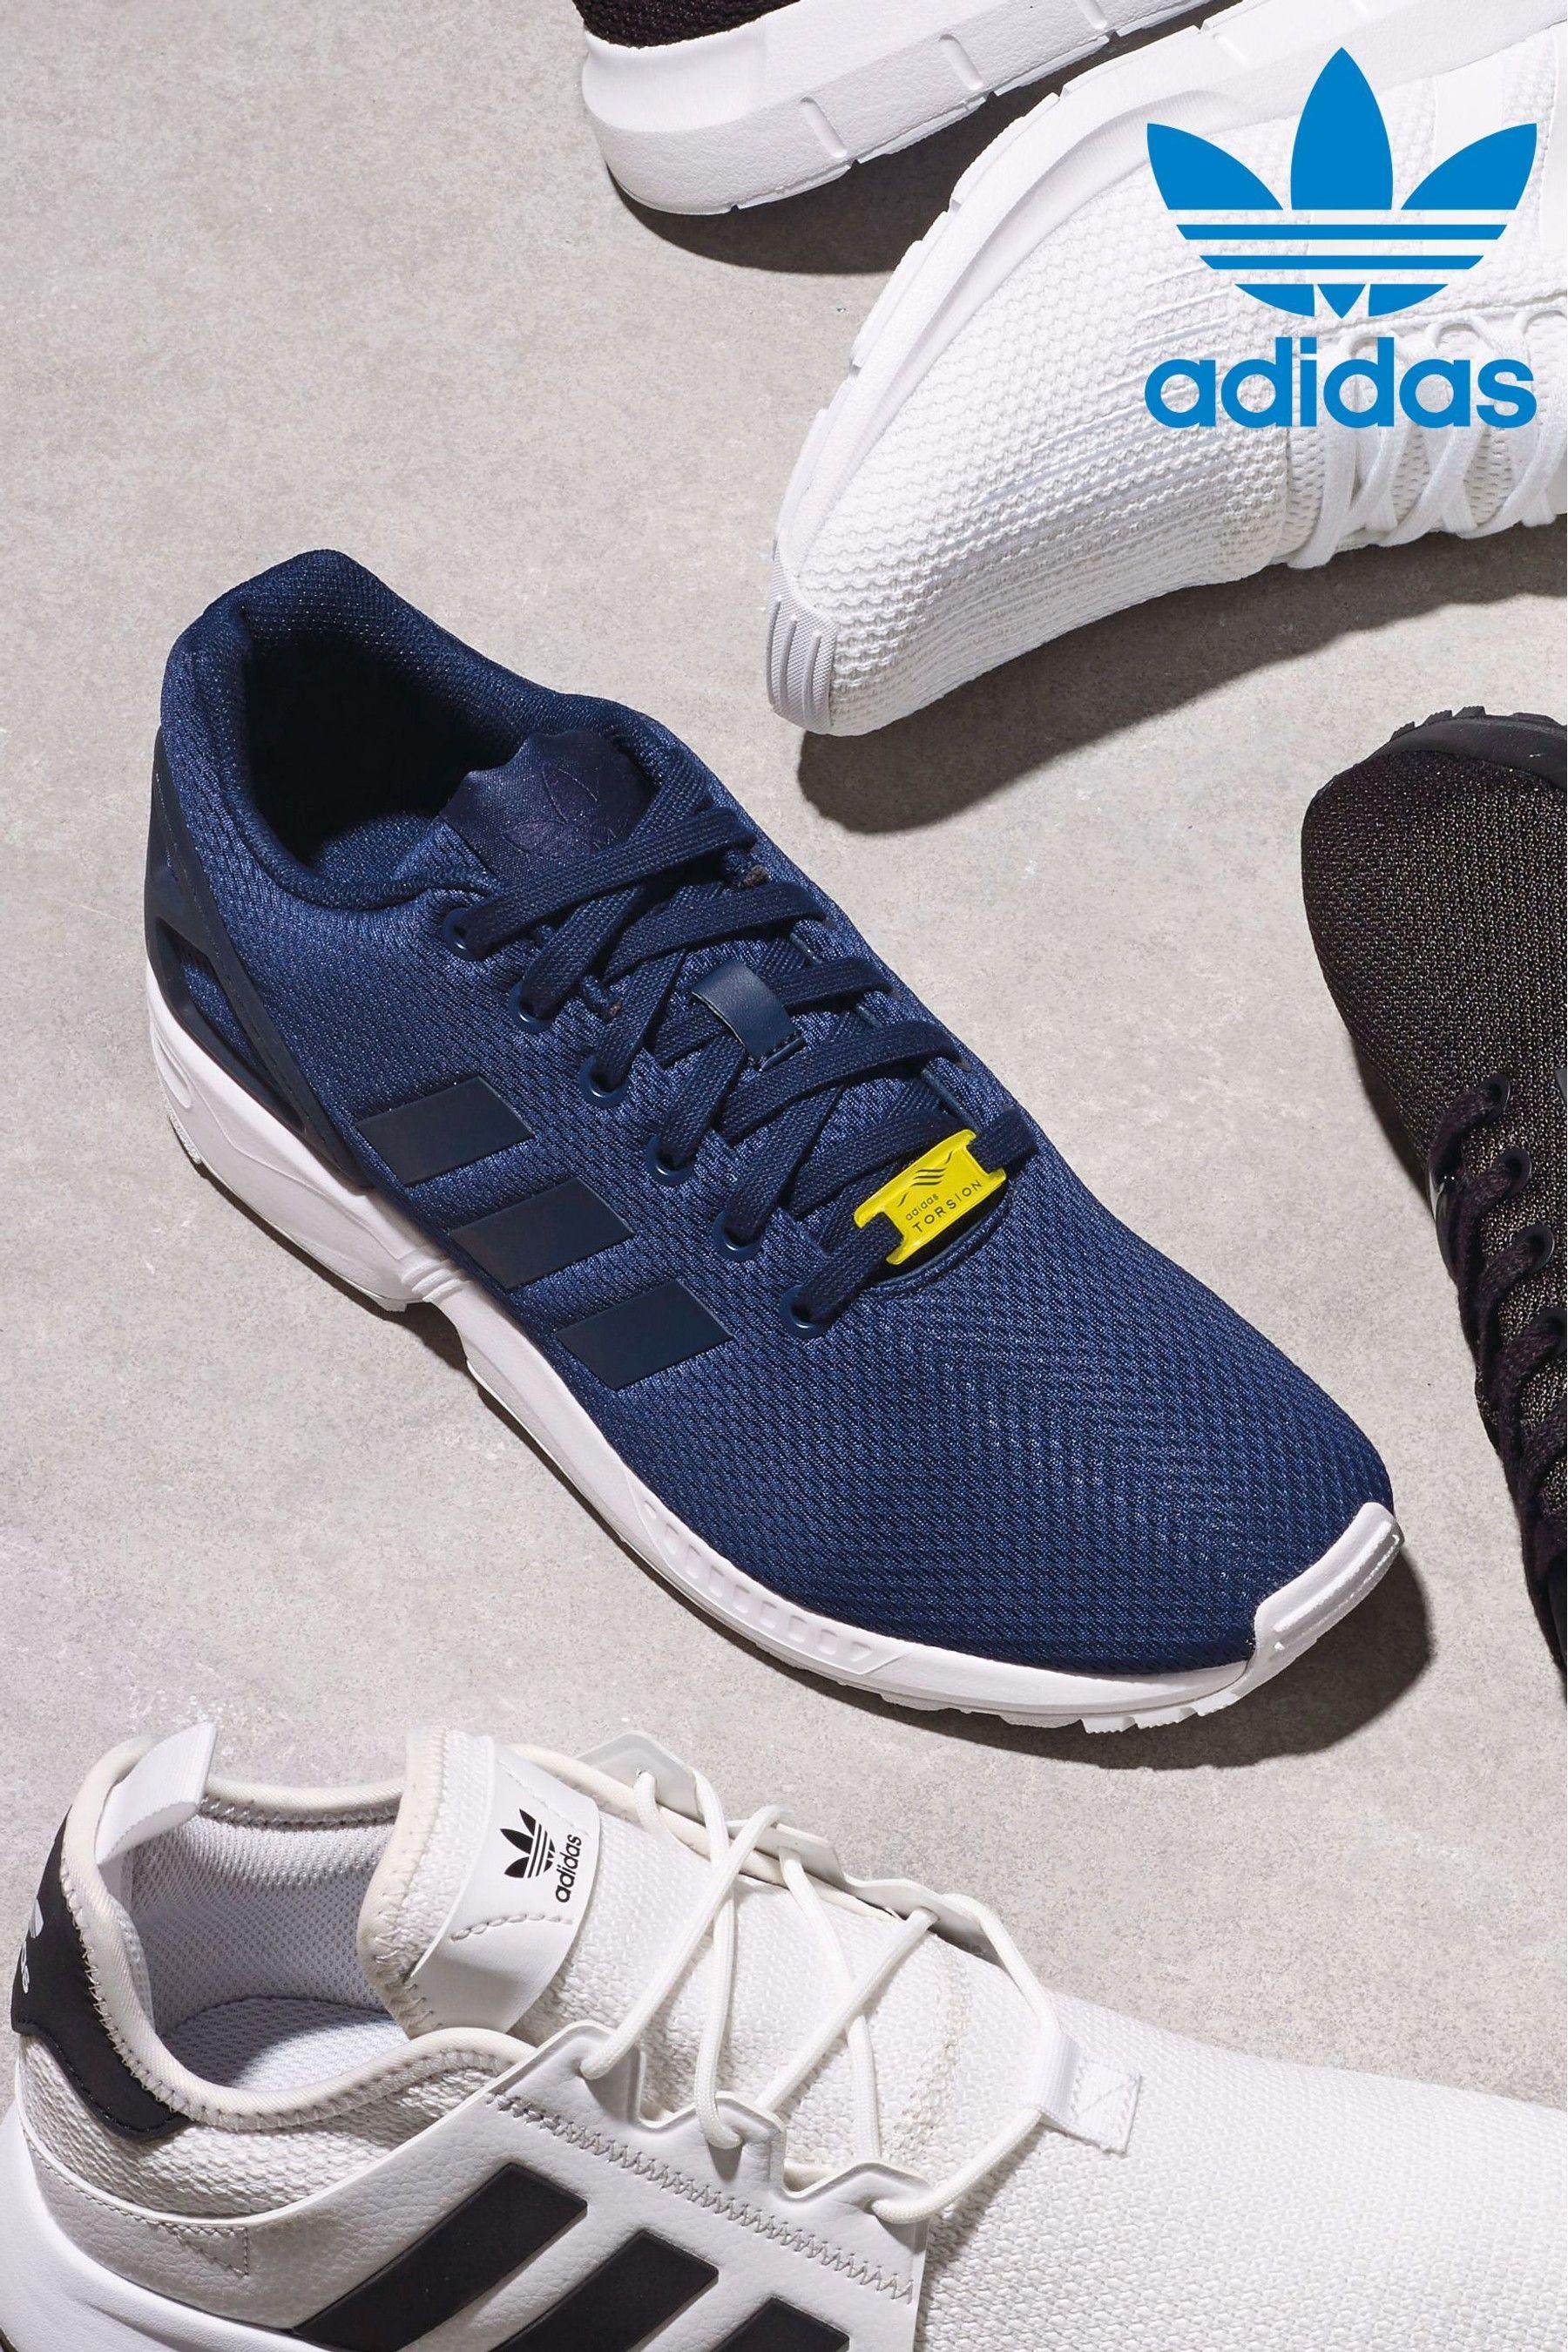 Geeignet Adidas Schuhe Online Shop adidas Originals ZX